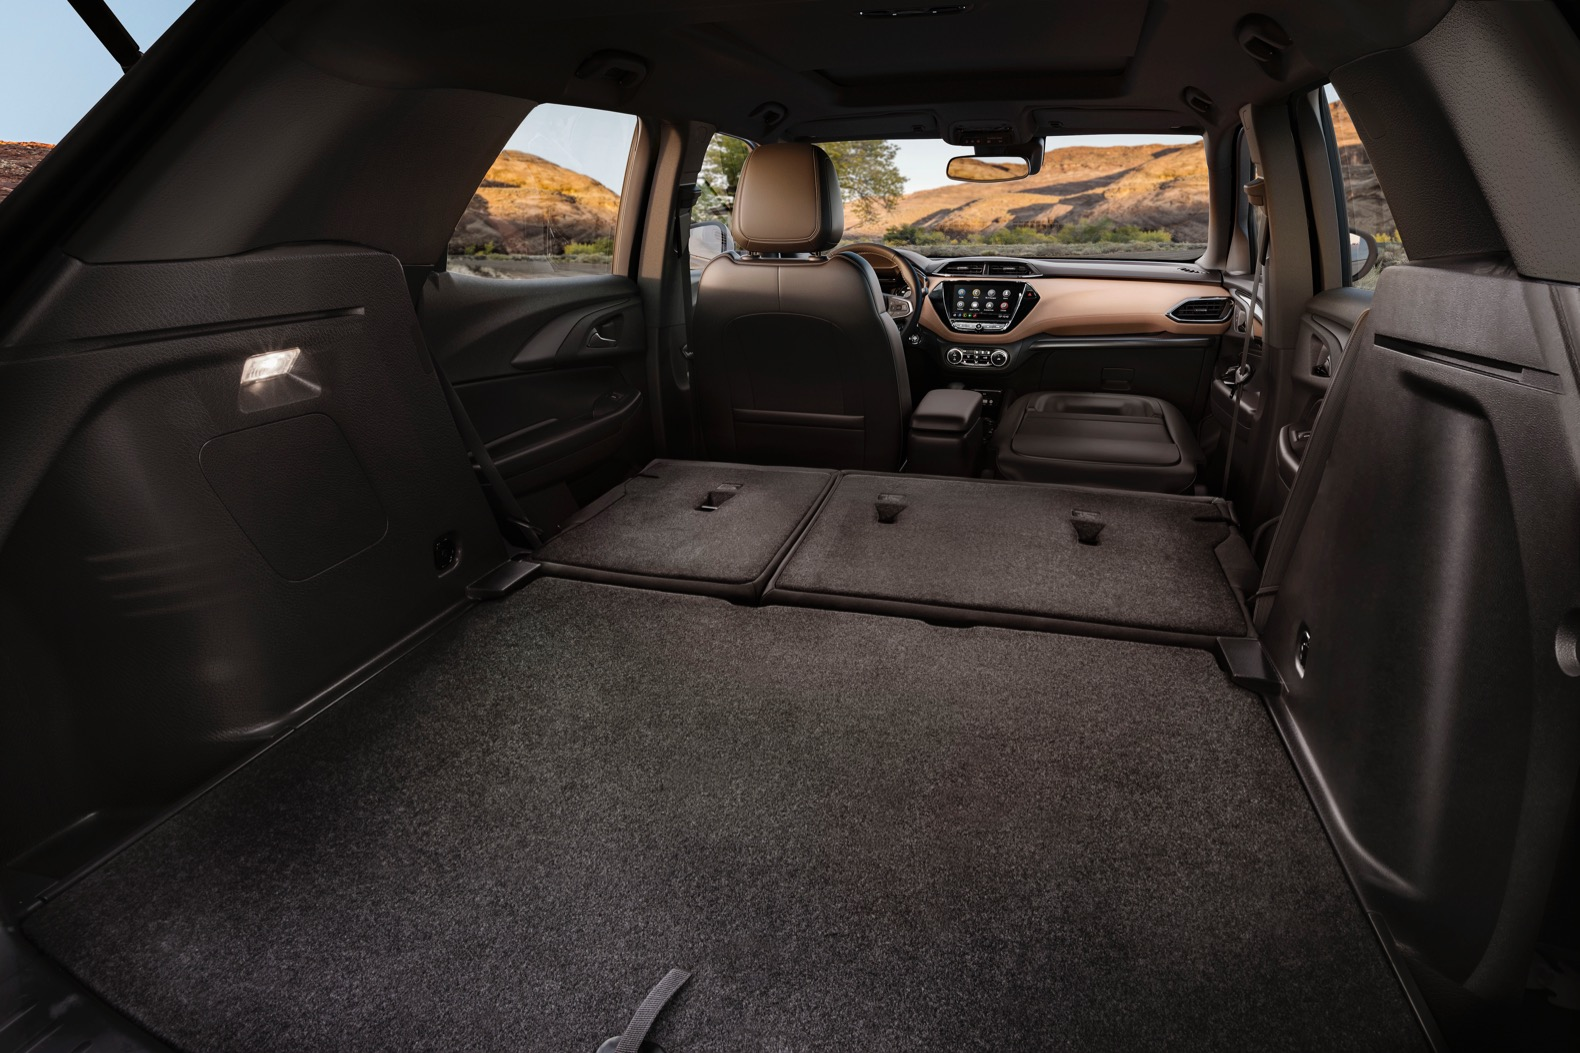 2021 Chevy Trailblazer starts at $19,995   The Torque Report